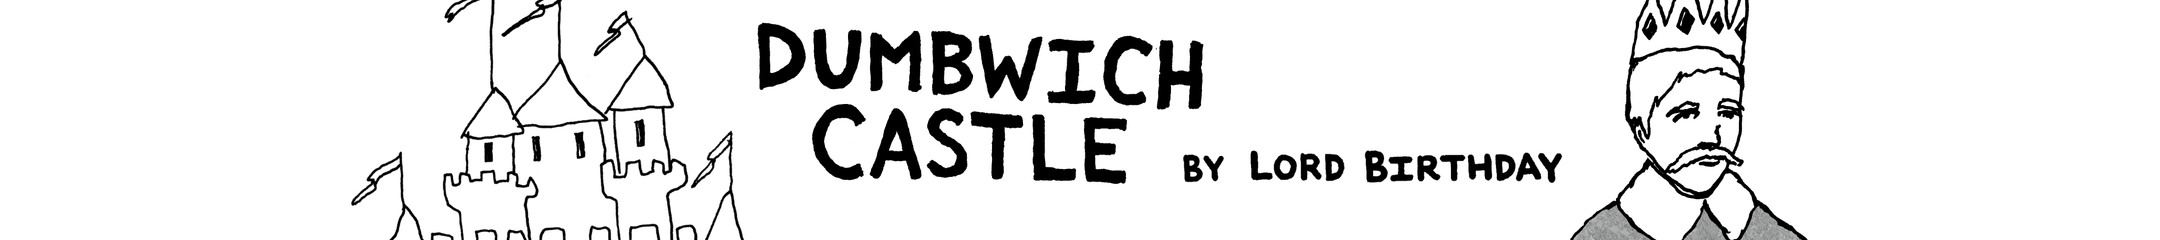 Dumbwich Castle